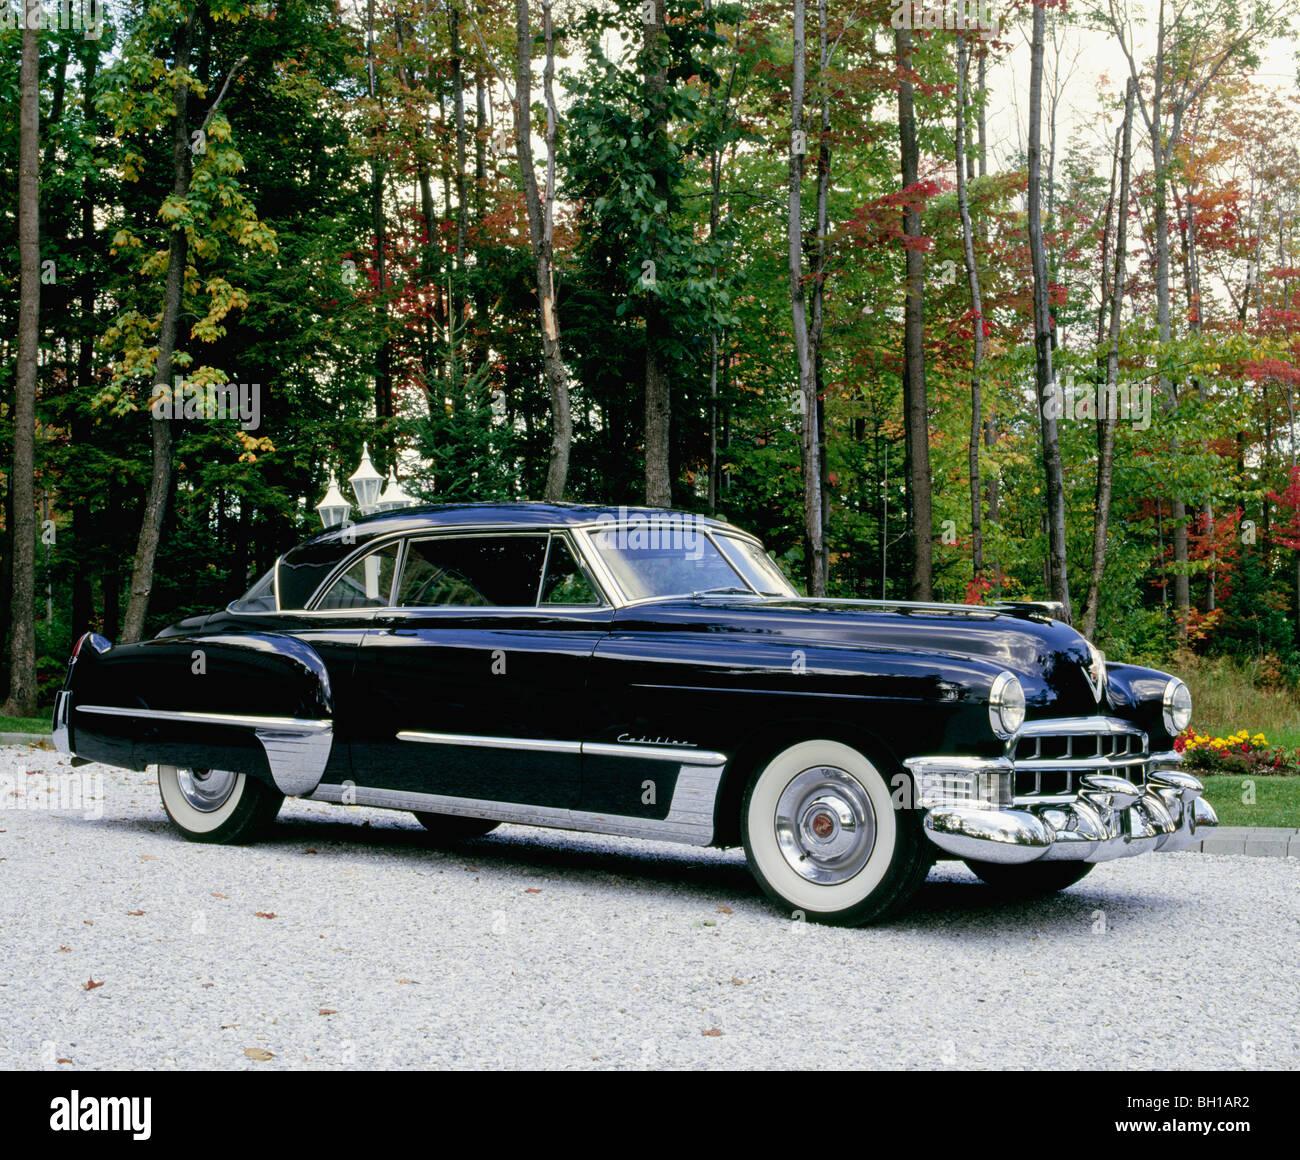 Cadillac Series 62 Stock Photos Images 1951 Coupe Deville For Sale Vintage De Ville Car Waterloo Quebec Canada